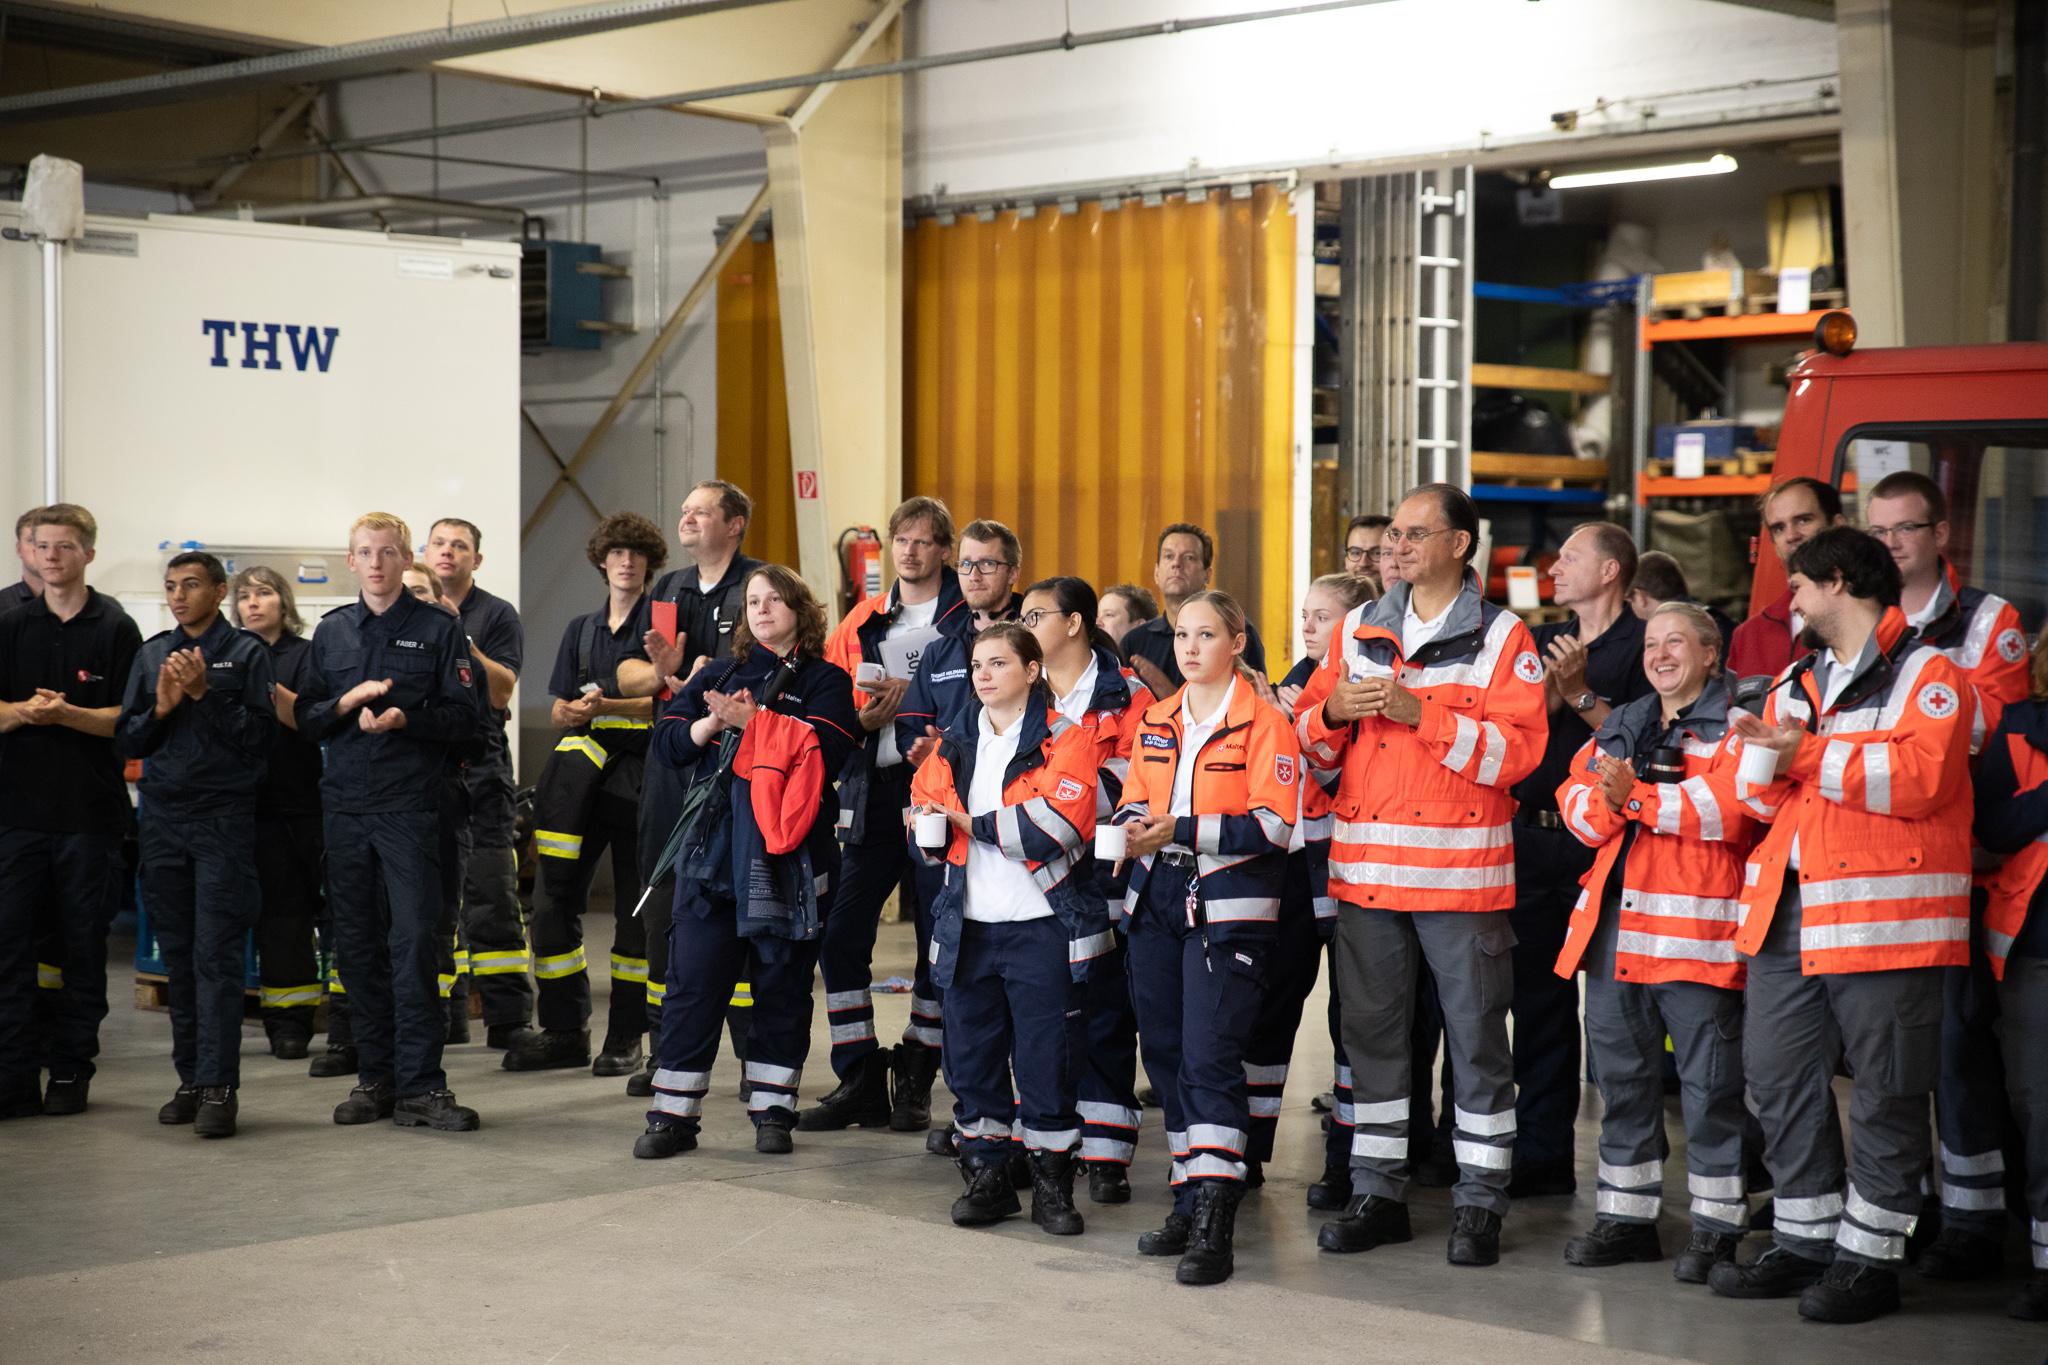 FeuerwehrSim 2019 Begrung-7